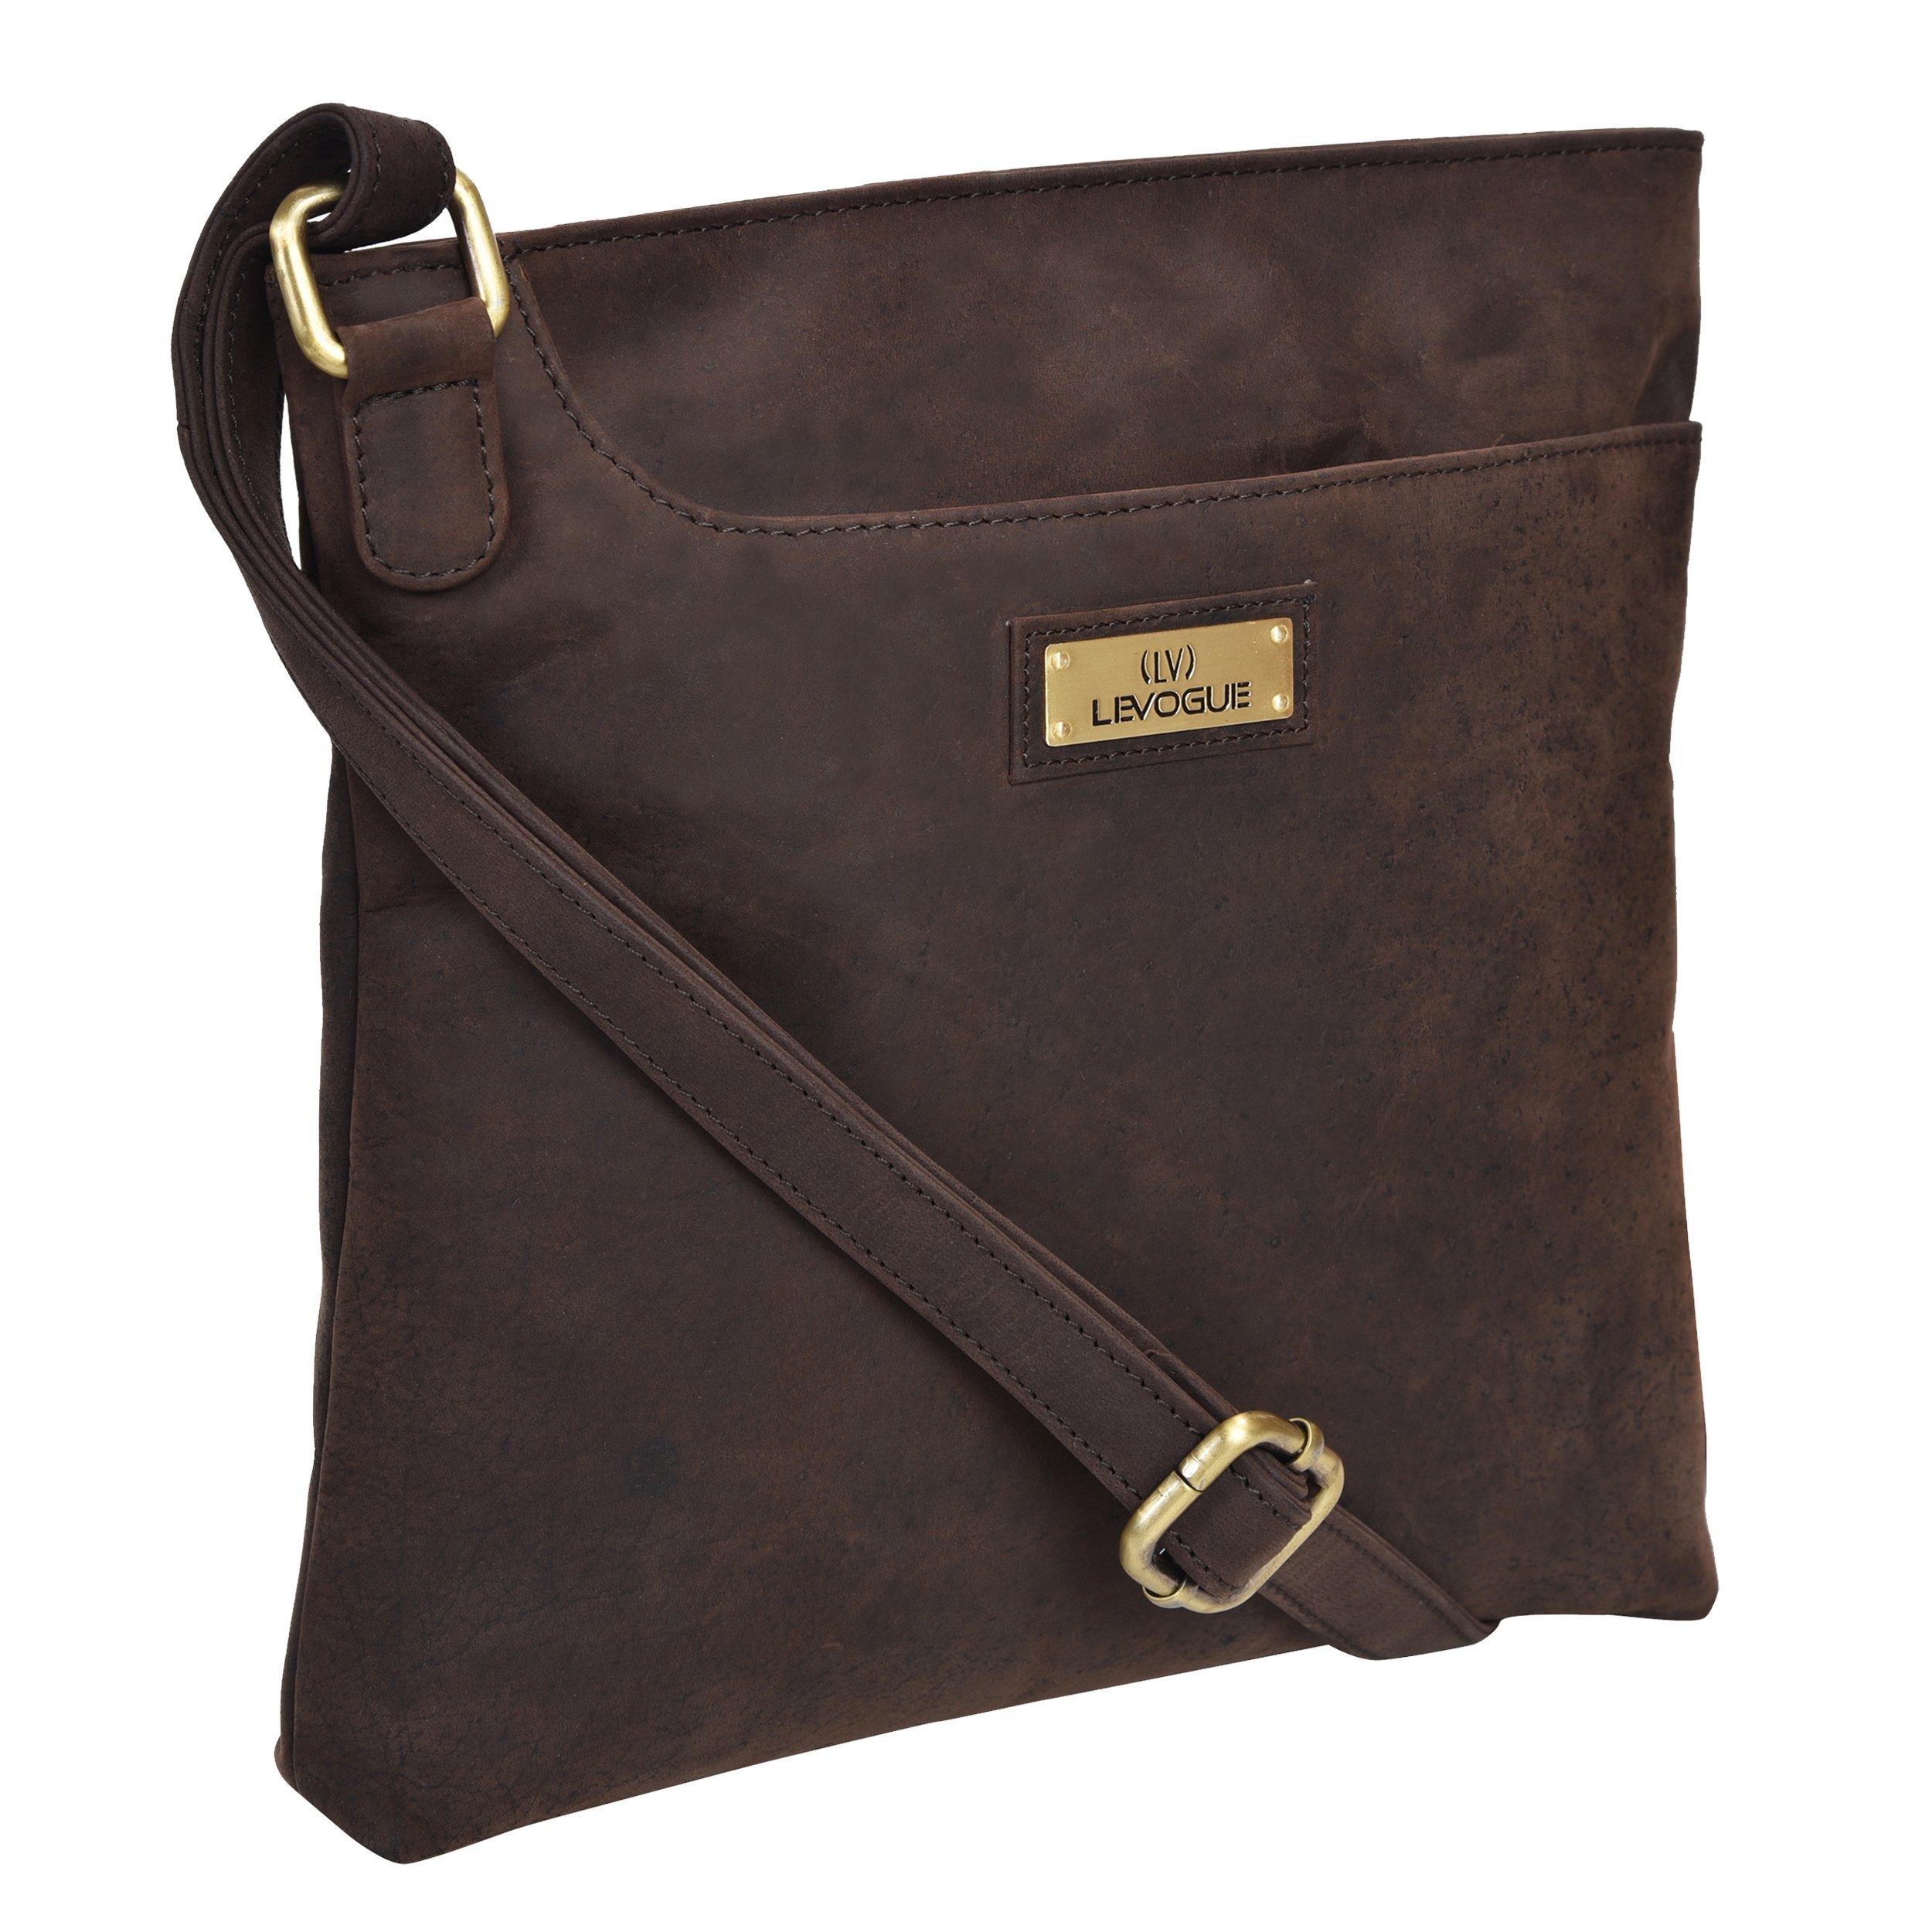 Genuine Leather Slim Womens Crossbody - Over the shoulder bag for Women Handmade by LEVOGUE (BROWN OILY HUNTER)